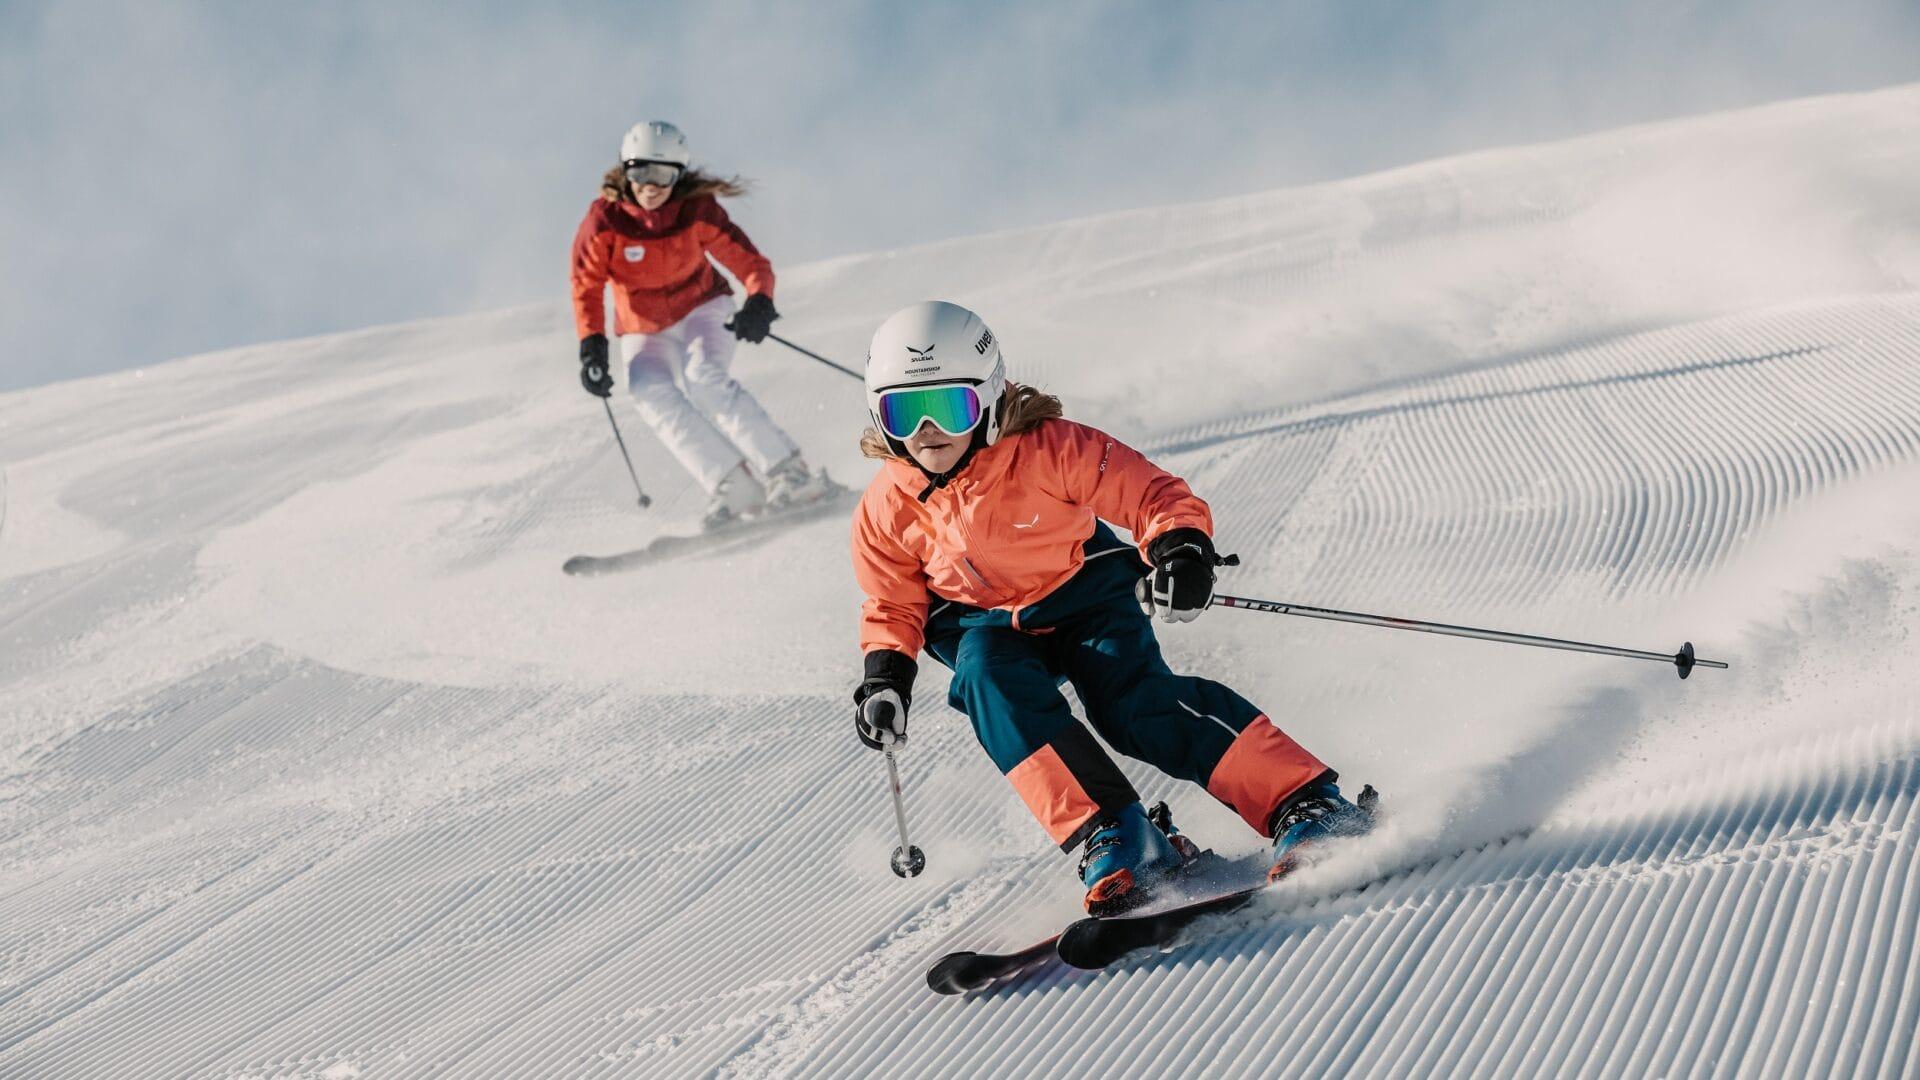 Hofgut-apartment-&-lifestyle-resort-wagrain-familienurlaub-freiheit-spüren-als-Familie-skiamade-skifahren